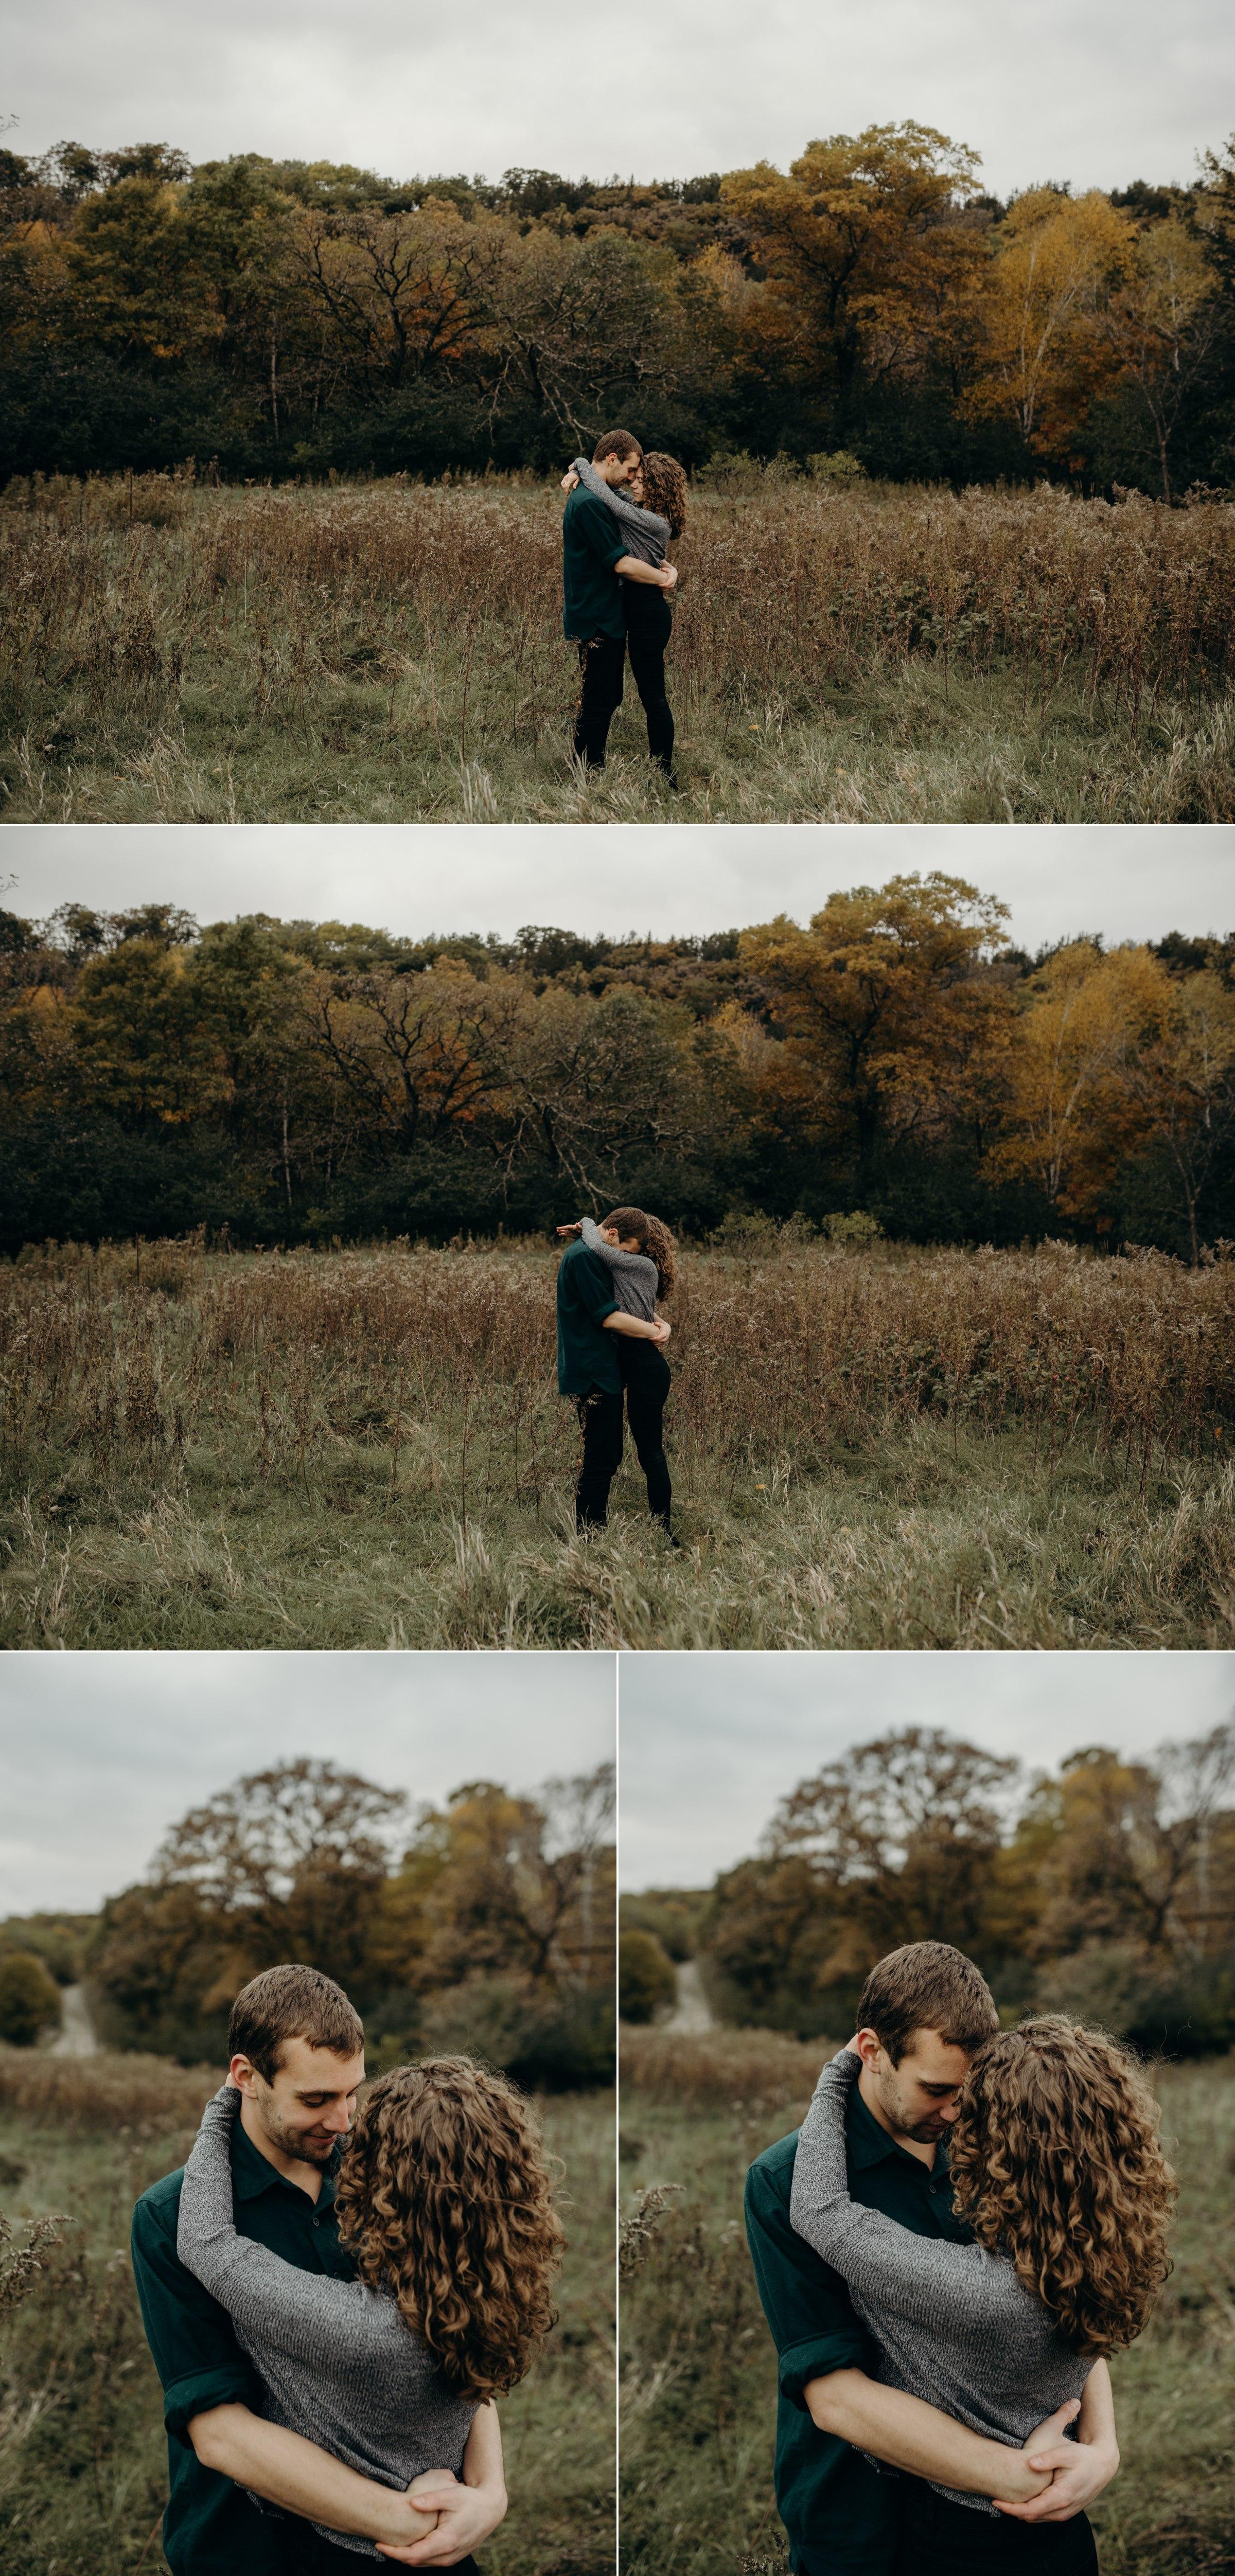 nickmezaphotography-austin-minneapolis-wedding-photographer-elopement-best-intimate-adventurous-destination-texas-minnesota-engagement-jess-dan-spacesaver_0169.jpg